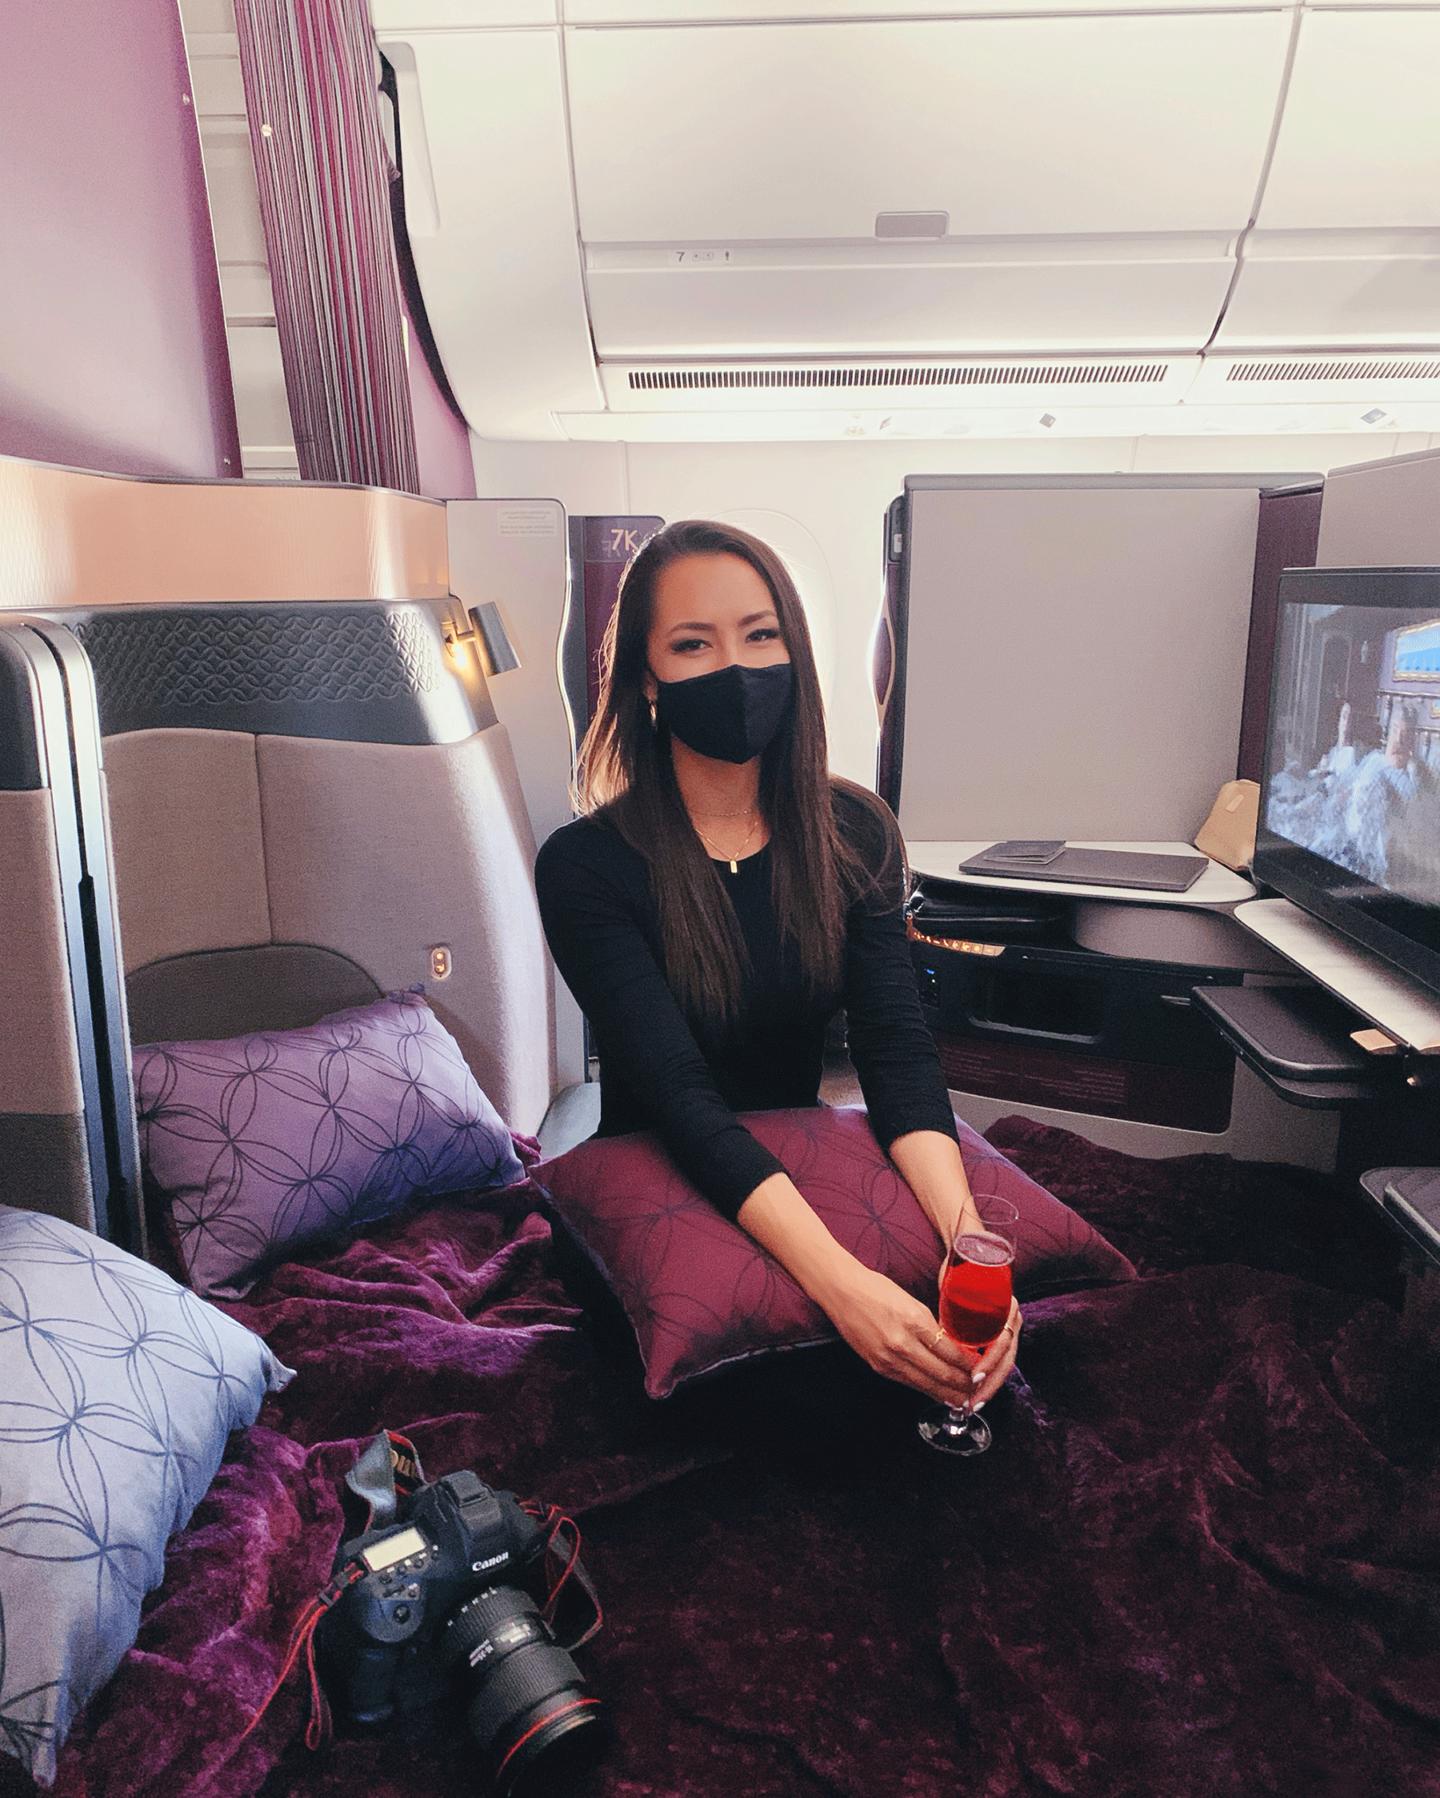 qatar airways, business class, maldives, flying, airplane, blogger